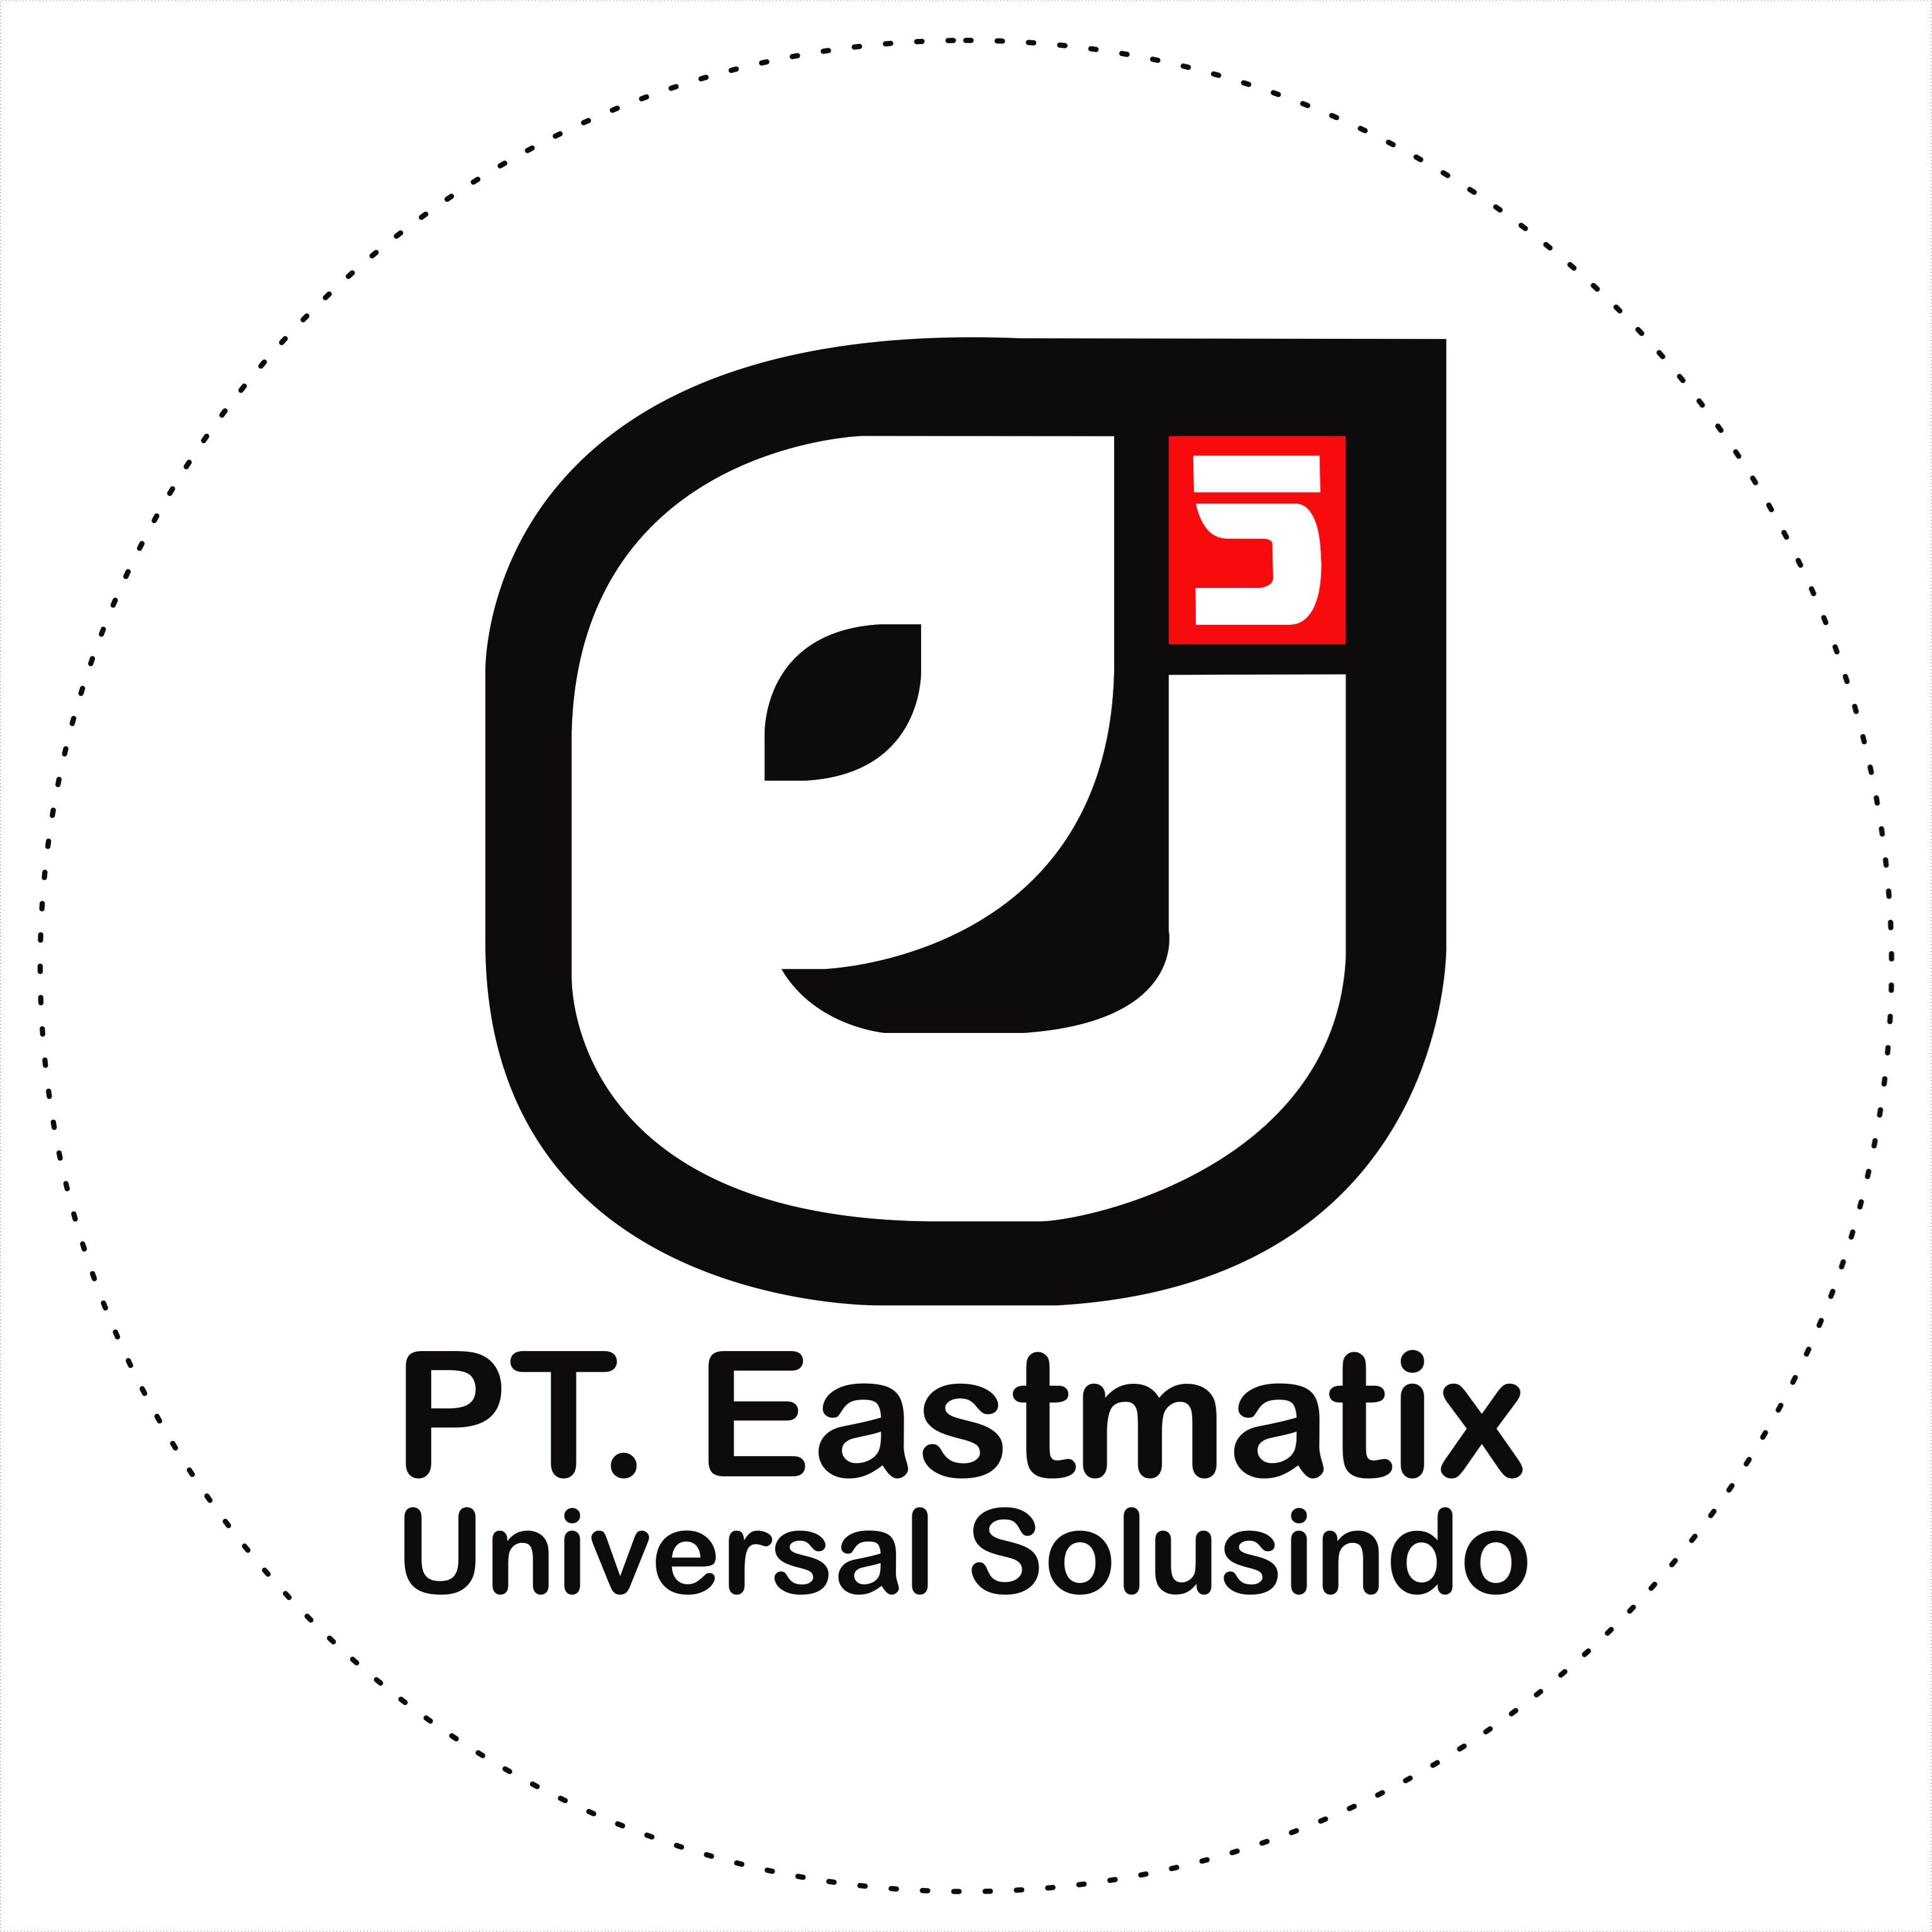 Eastmatix Universal Solusindo